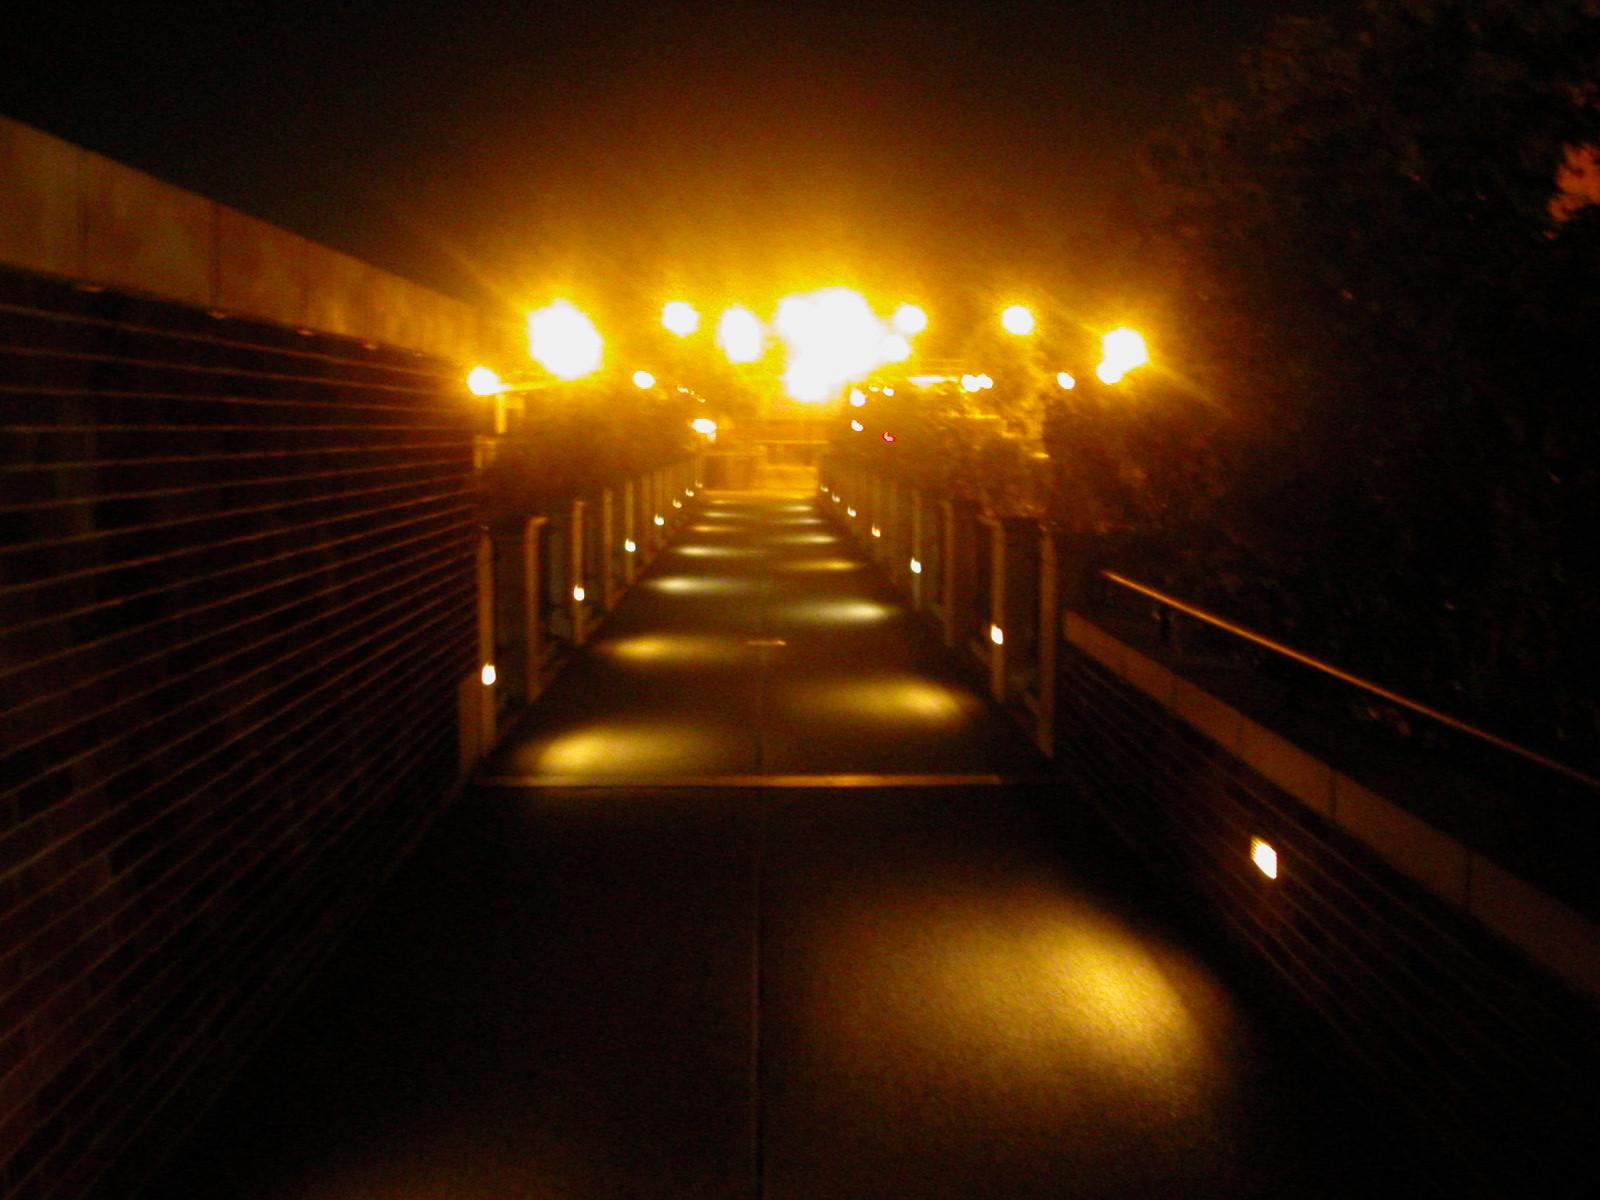 ucla campus at night - photo #38